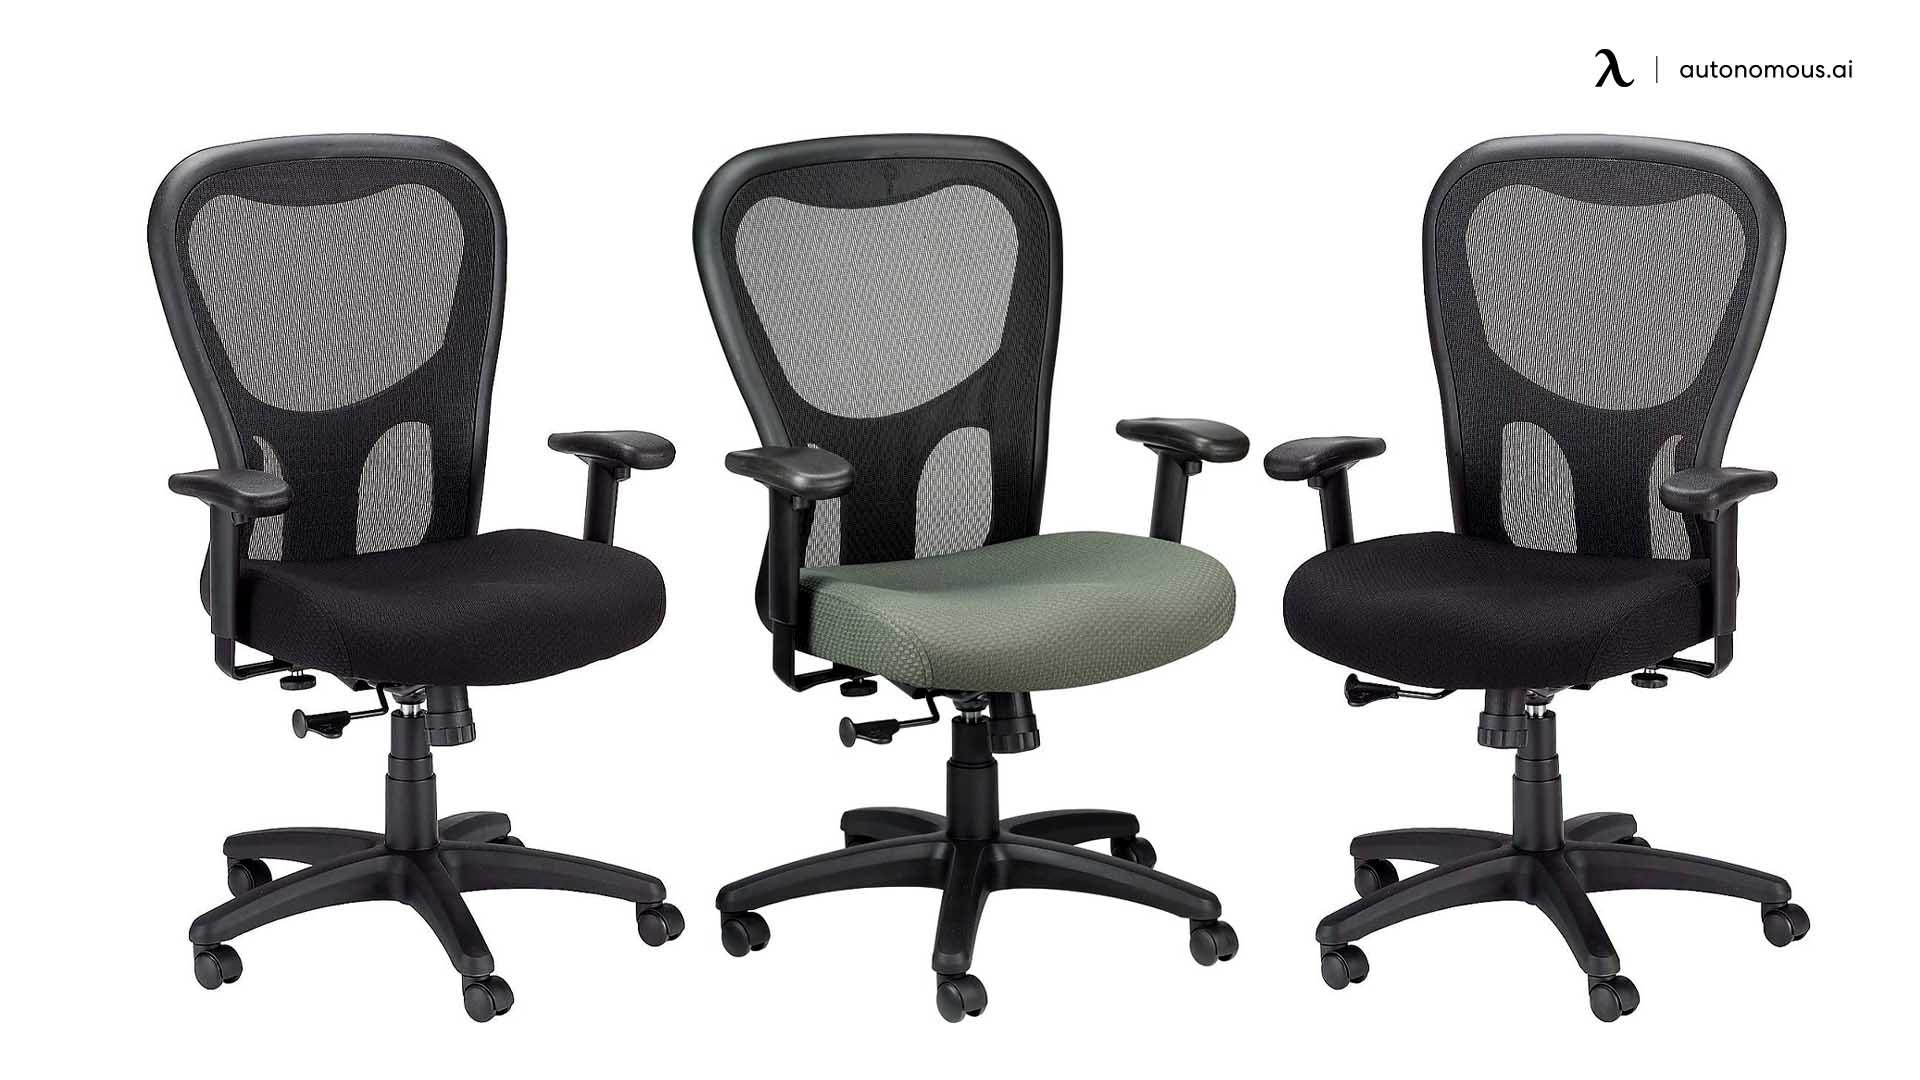 Tempur-Pedic TP9000 Mesh Ergonomic Chair